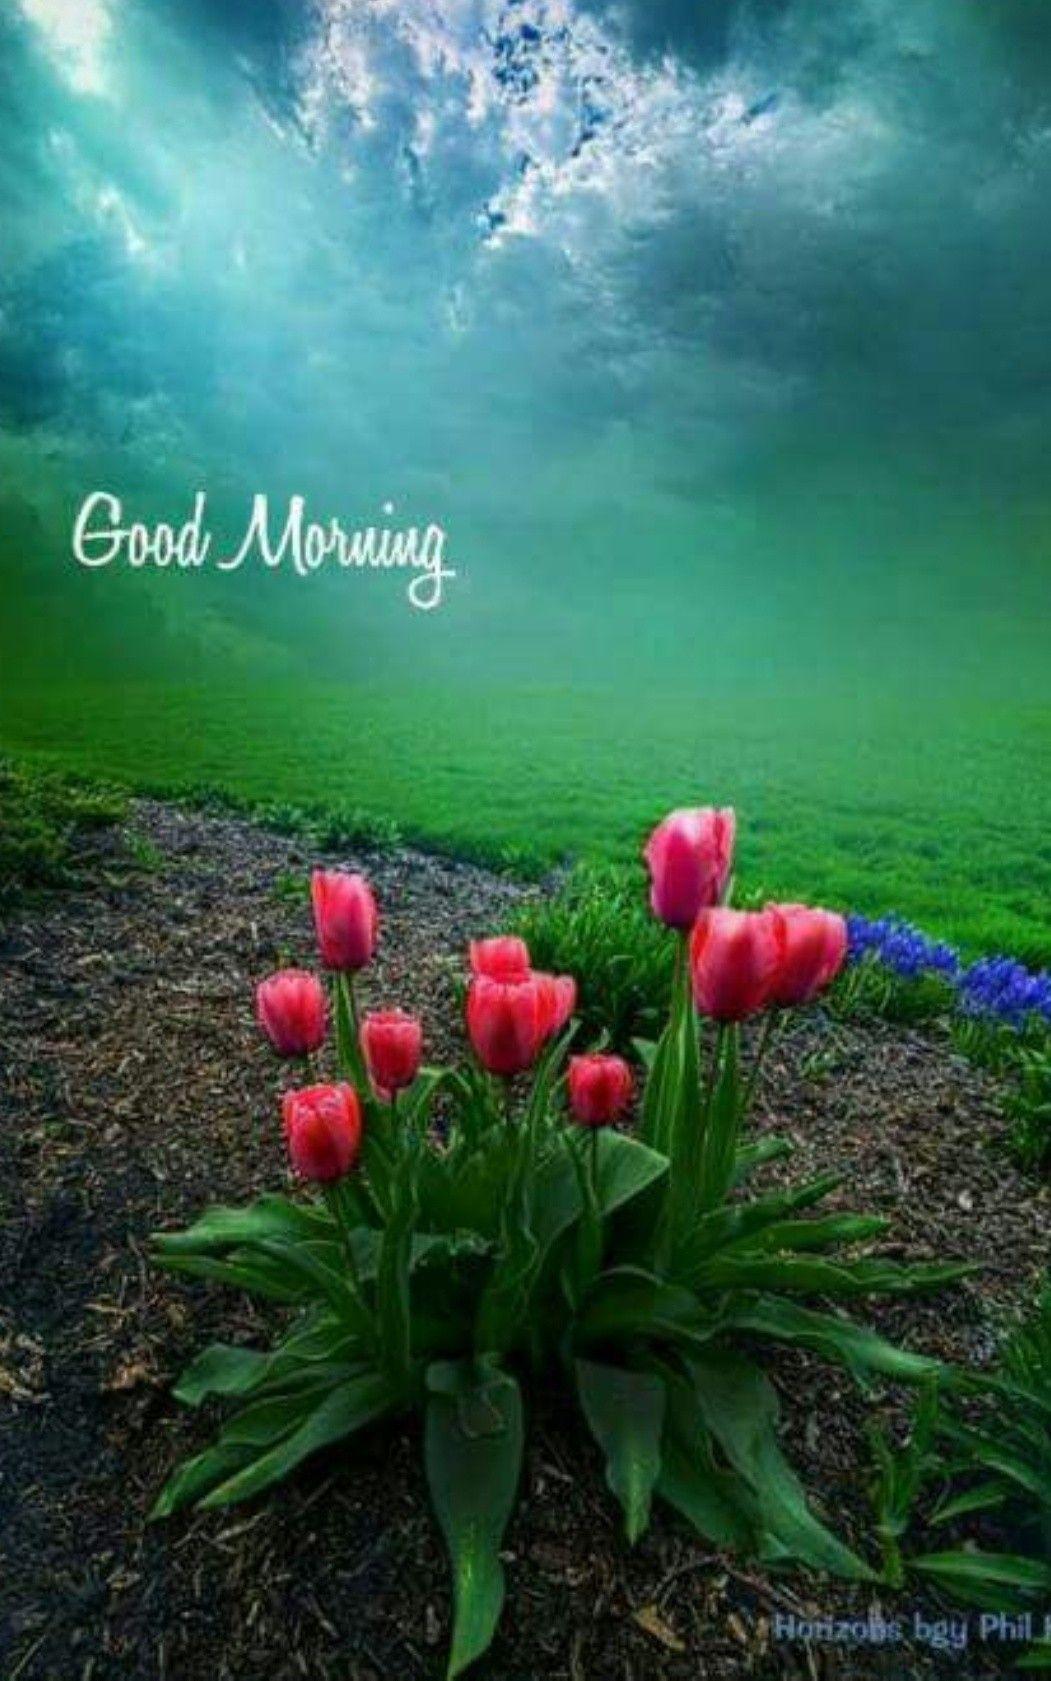 Good Morning Beautiful Landscapes Beautiful Nature Landscape Photography